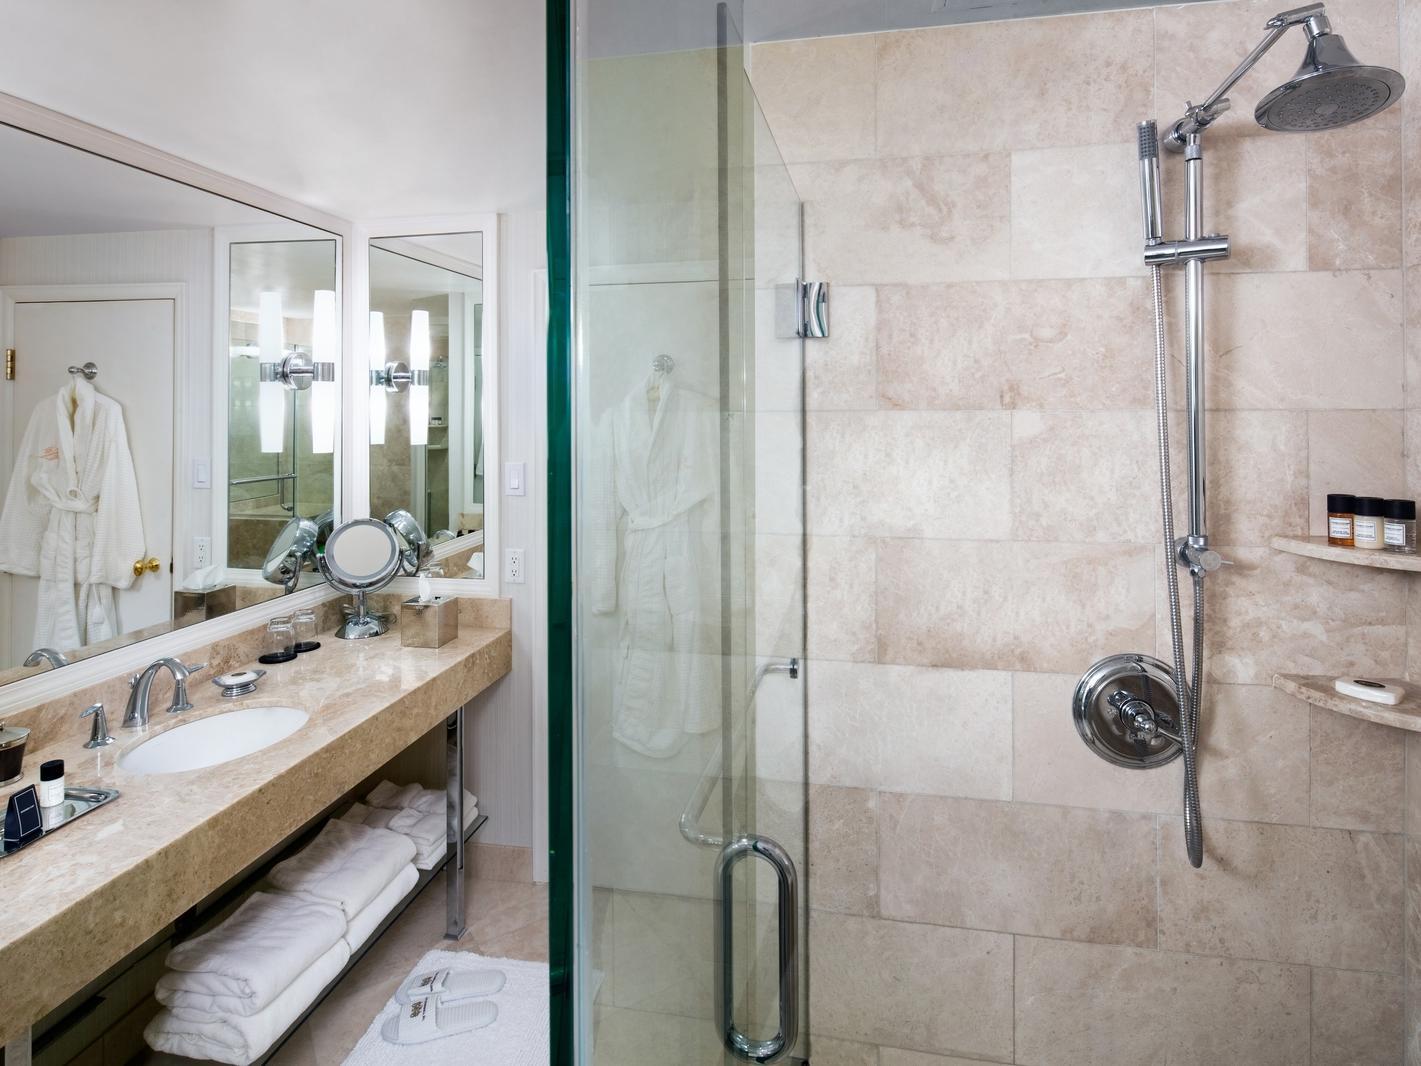 shower and vanity in hotel bathroom